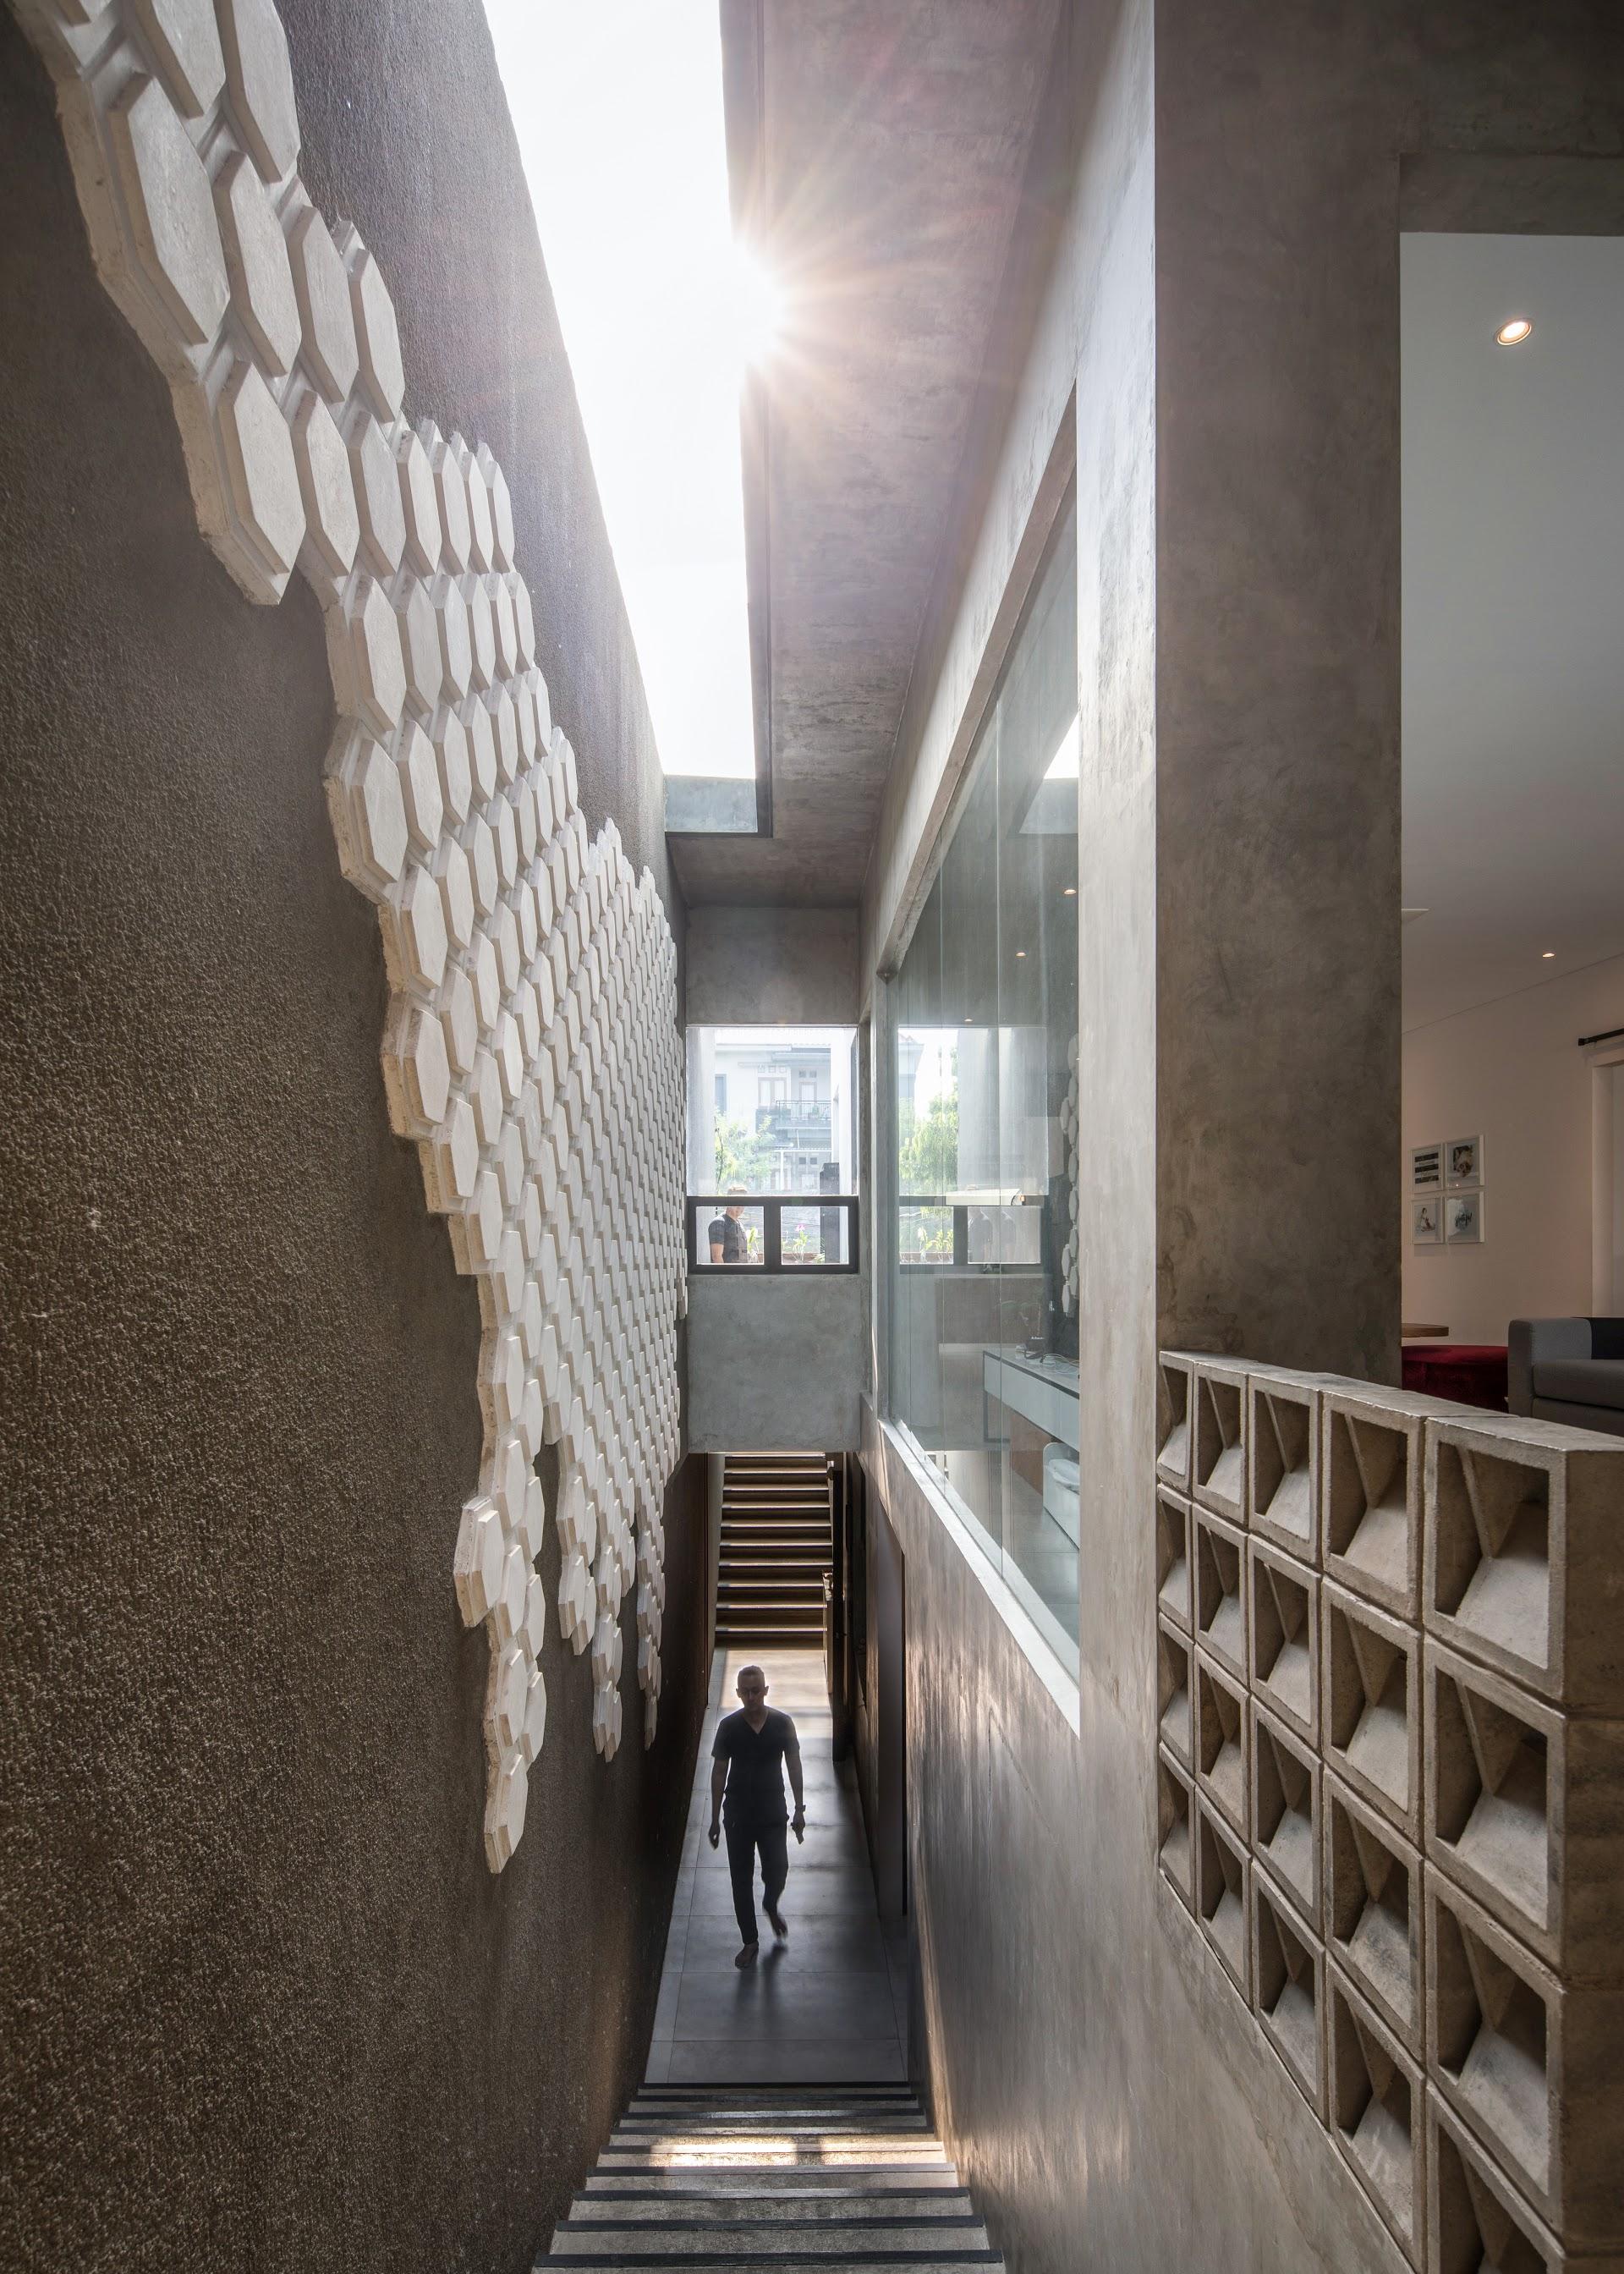 Mokie House minimalist modern